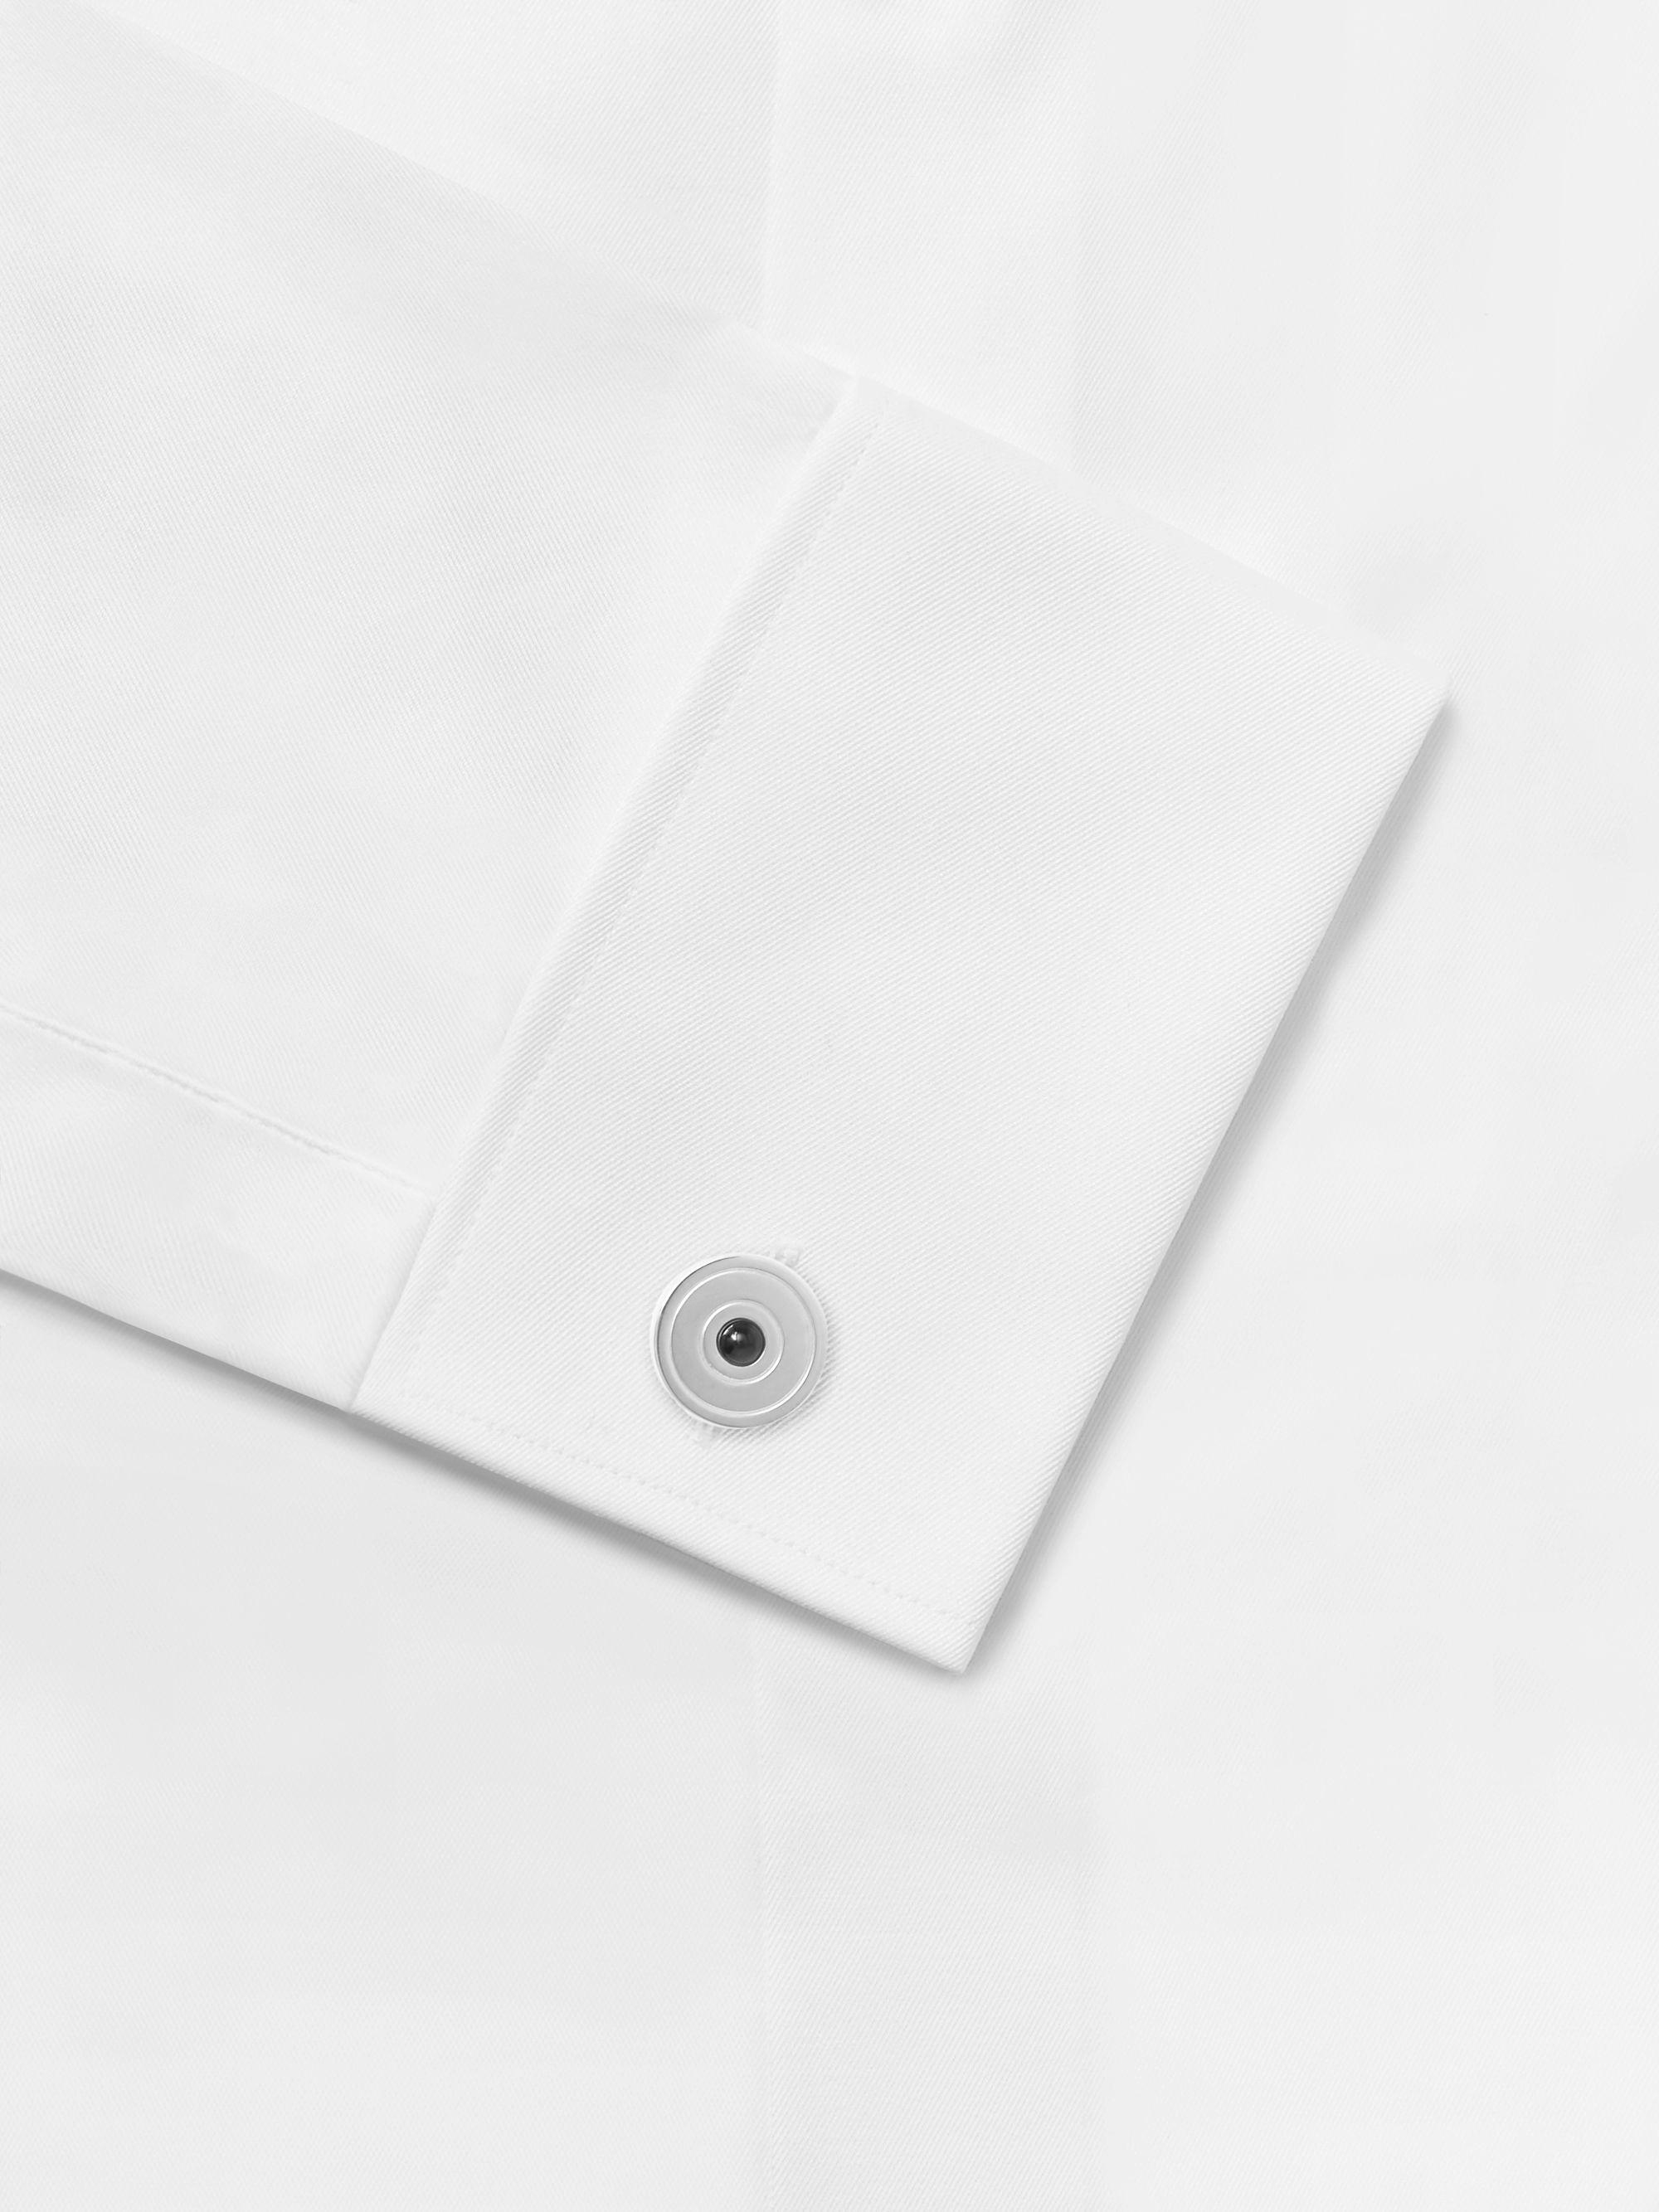 Silver Rhodium-plated Onyx Cufflinks | Lanvin